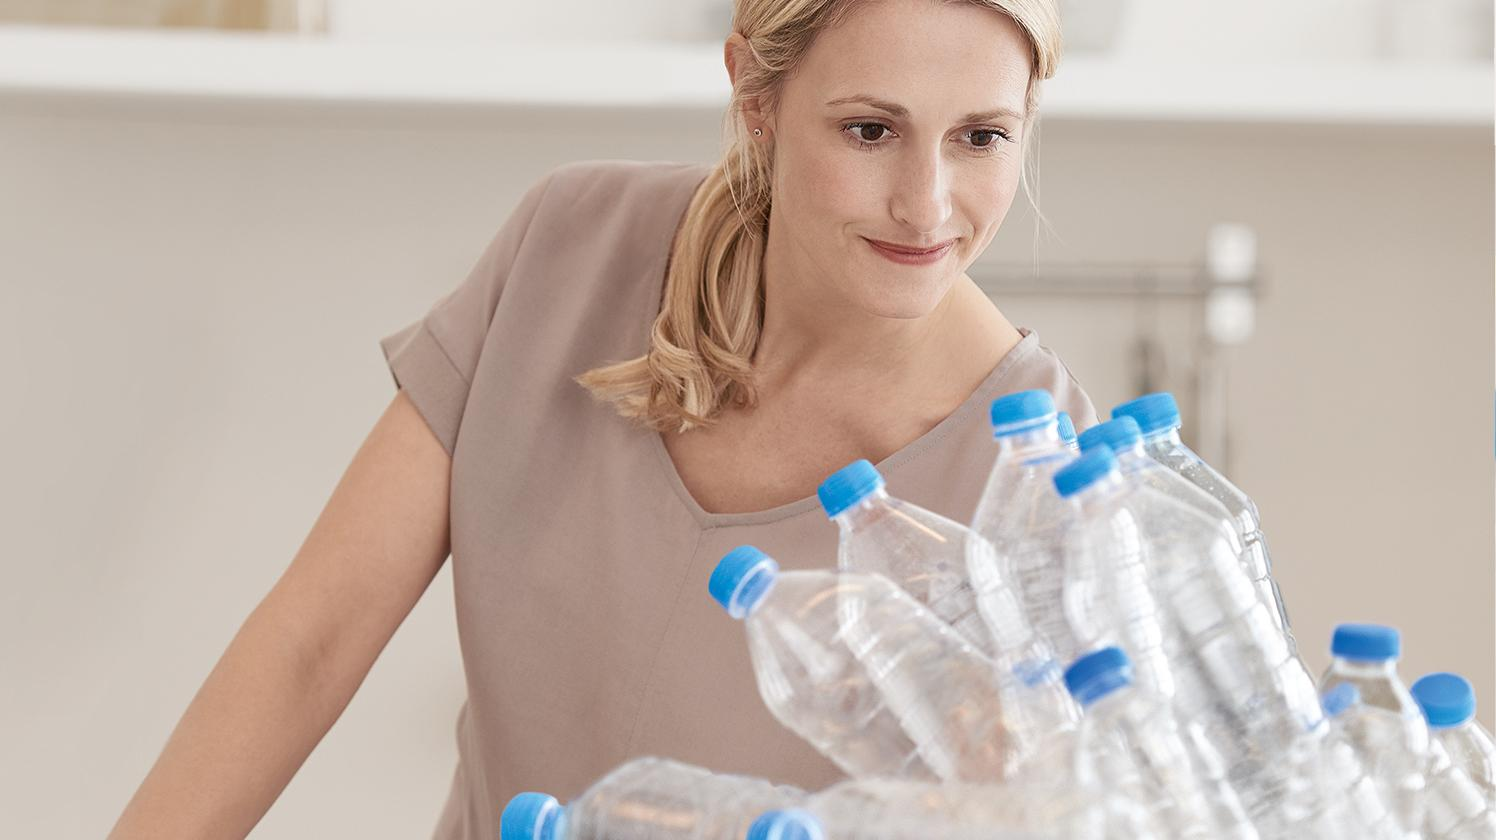 BRITA healthier planet plastic bottle